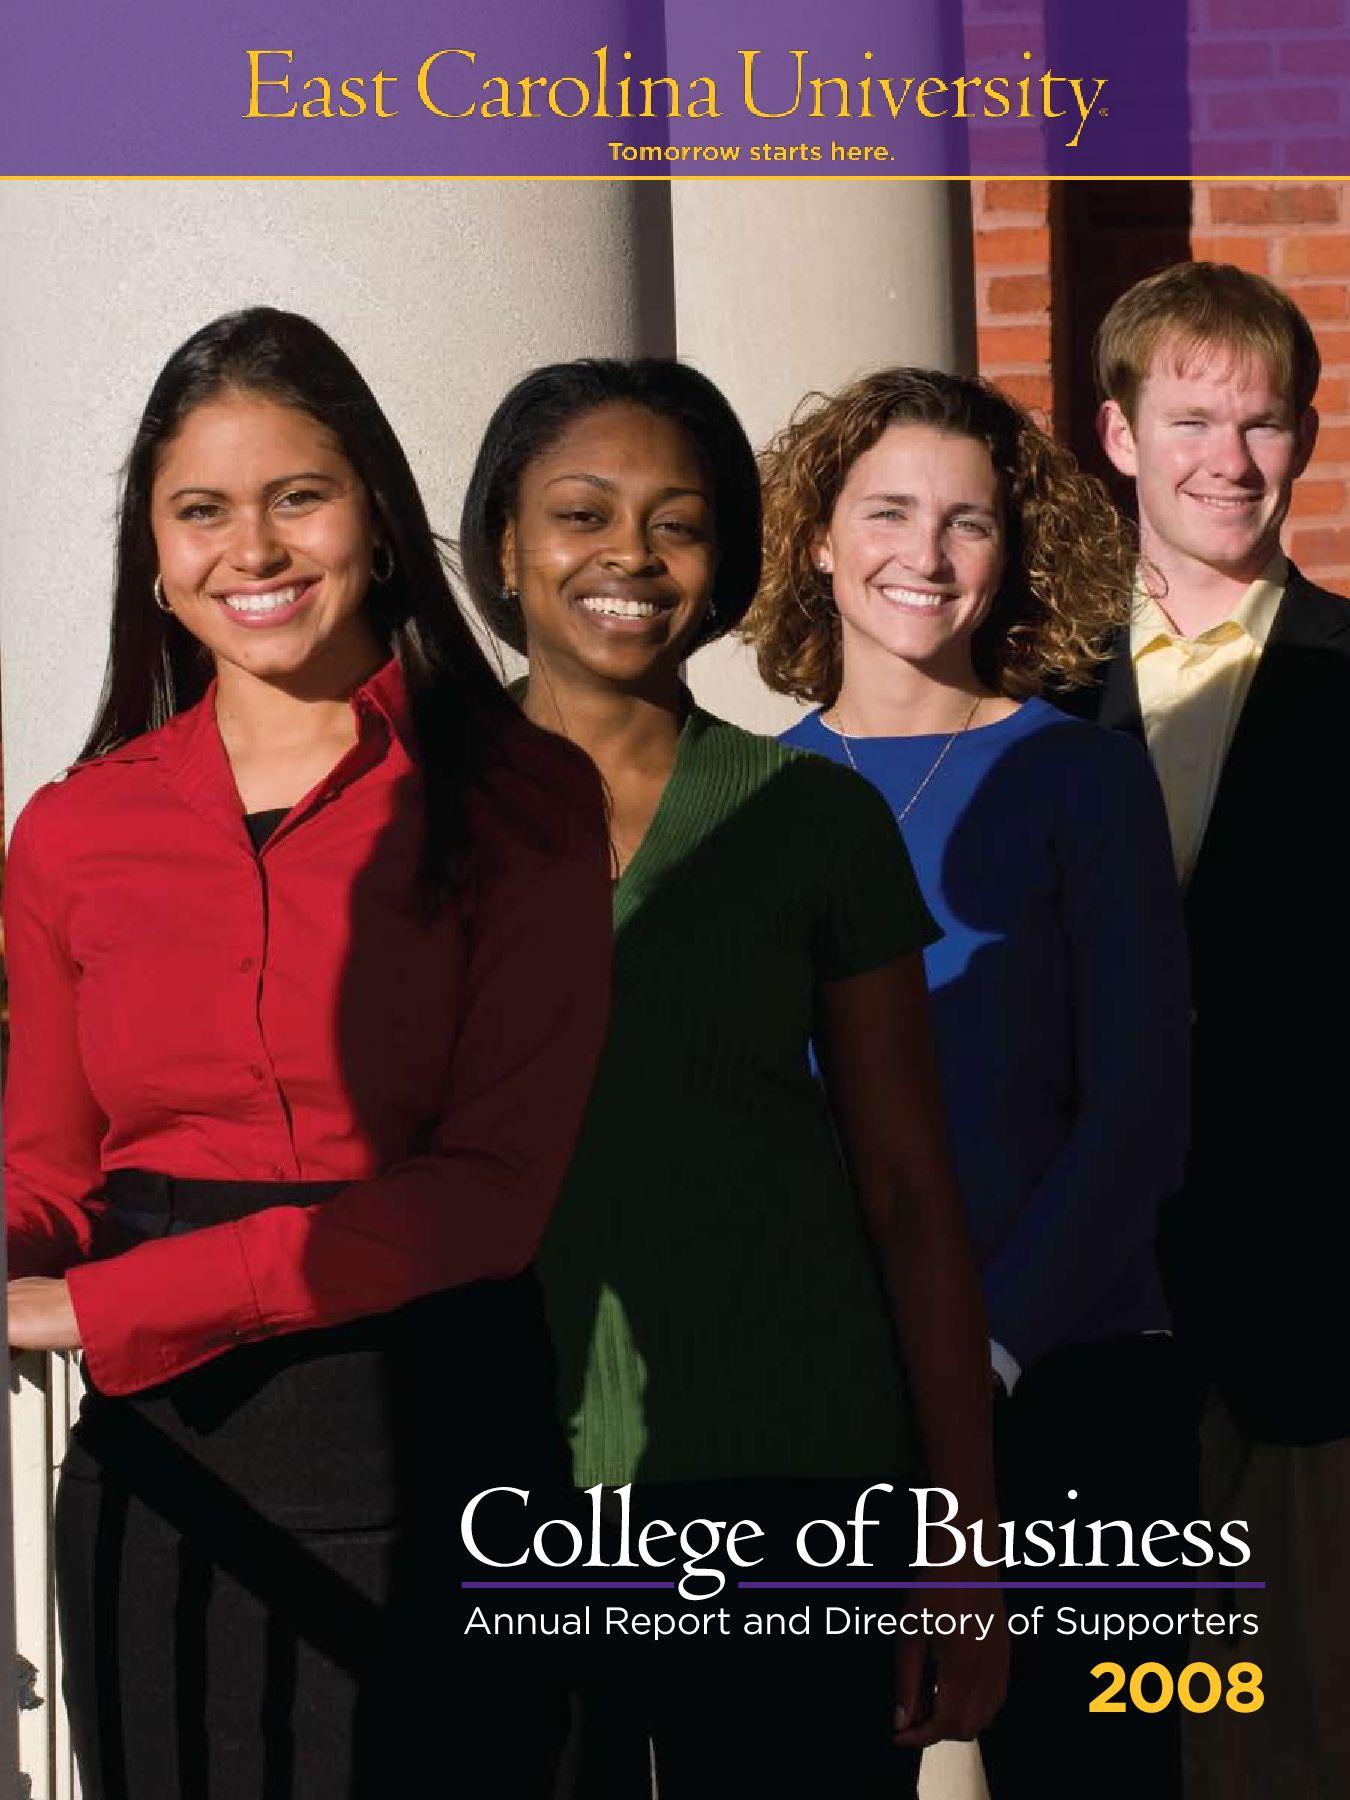 2008 COB Annual Report by East Carolina University - Issuu